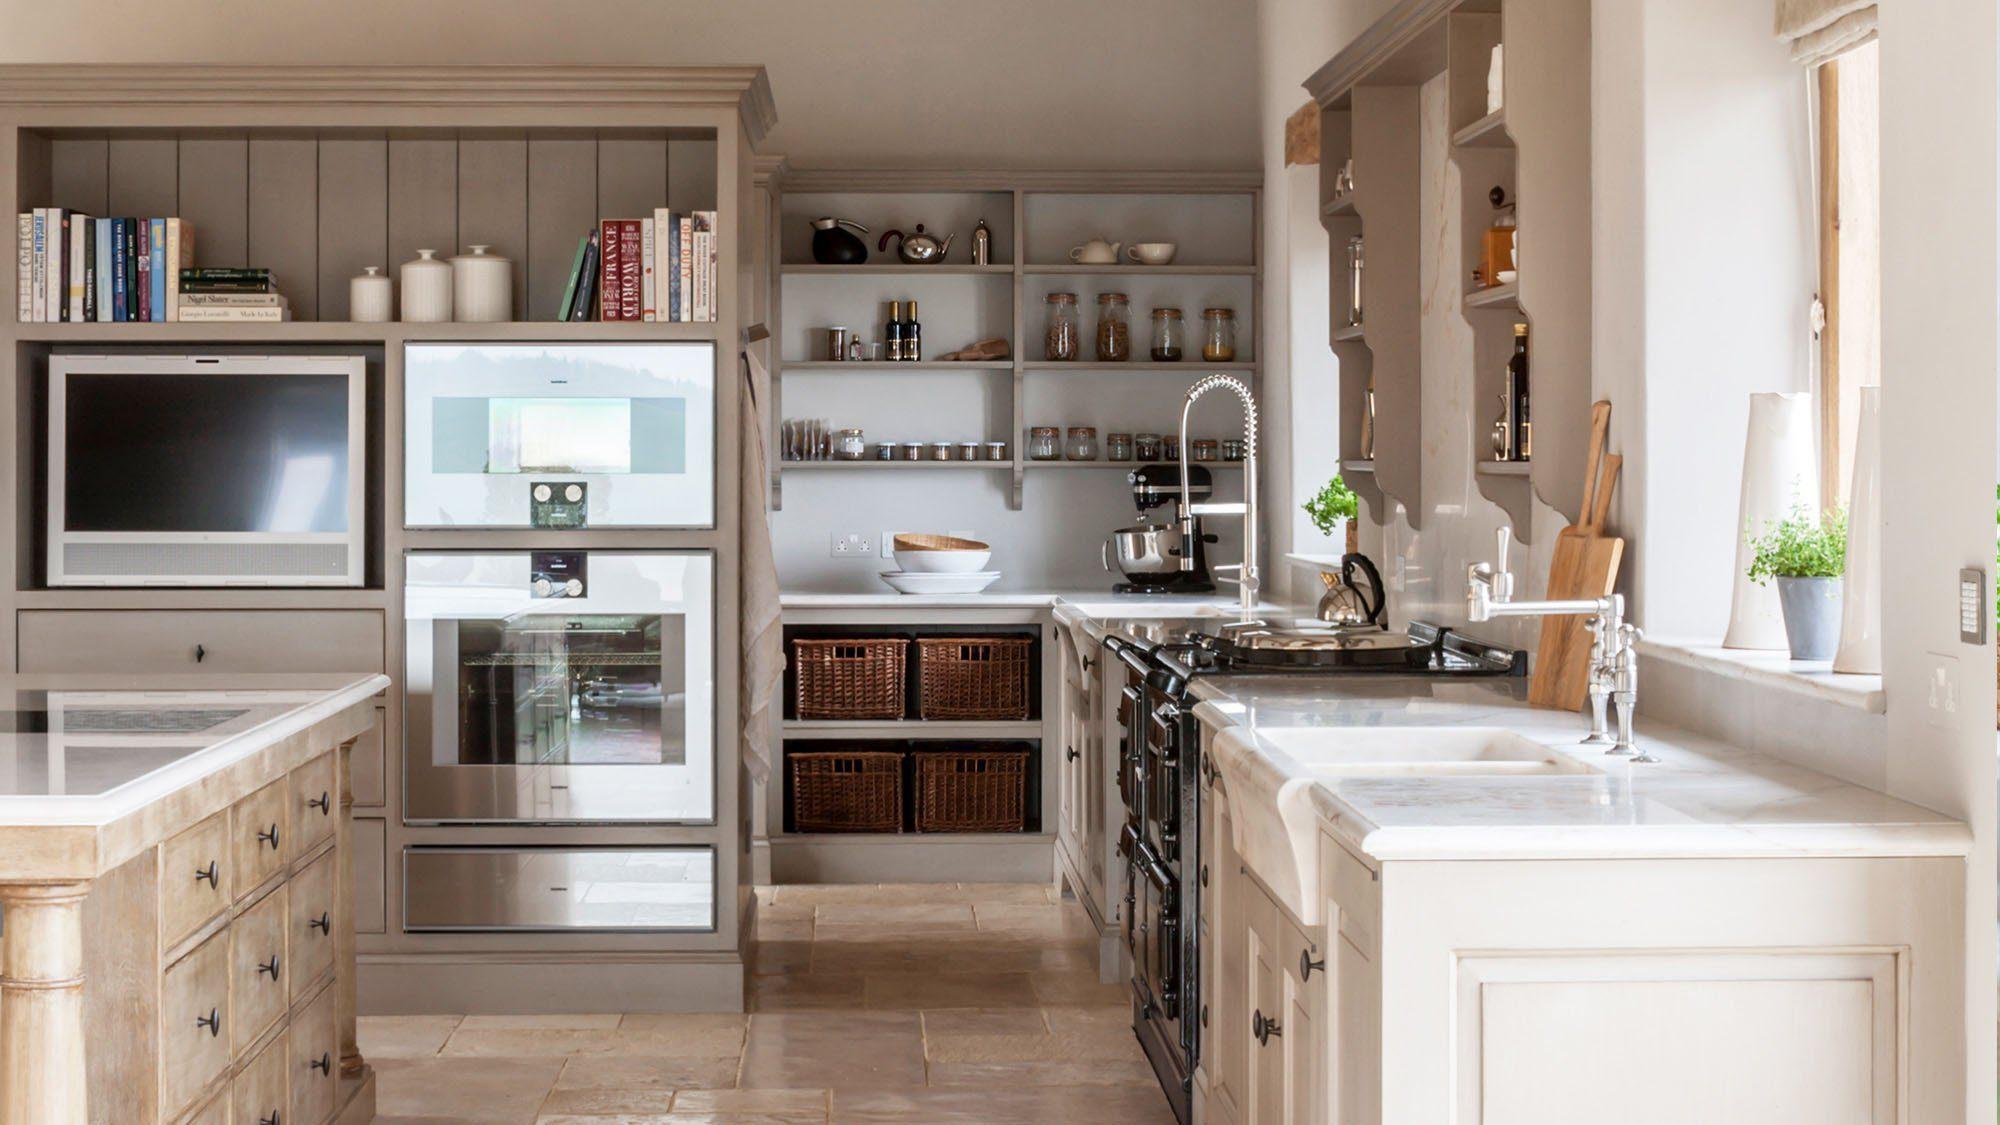 Designing a bespoke, luxury kitchen - Quarta option